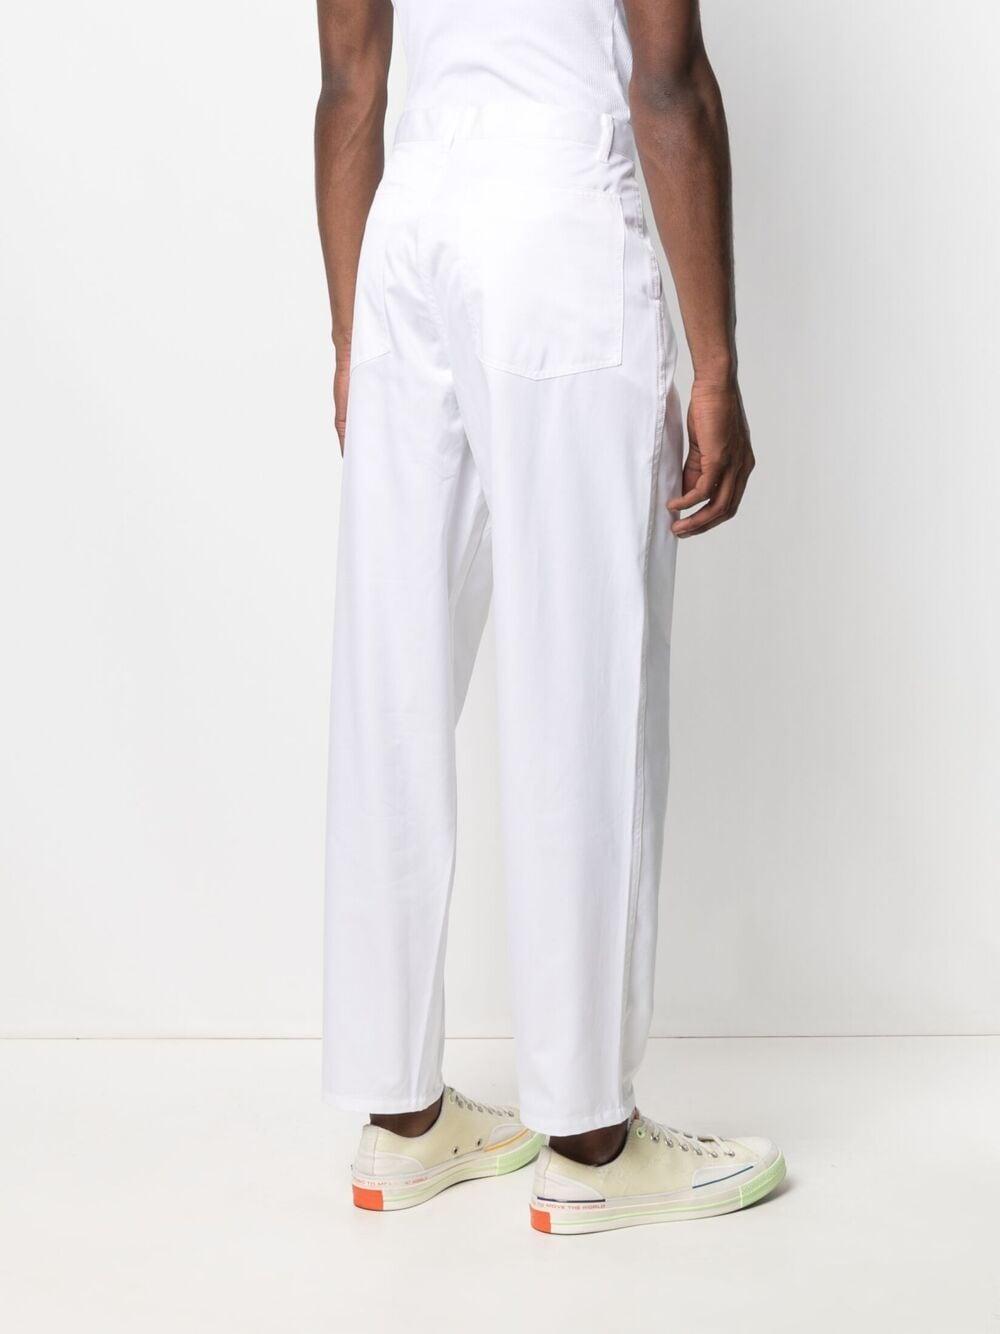 Comme Des Garçons Shirt high rise straight leg trousers man white COMME DES GARÇONS SHIRT | Trousers | FG-P015WHITE